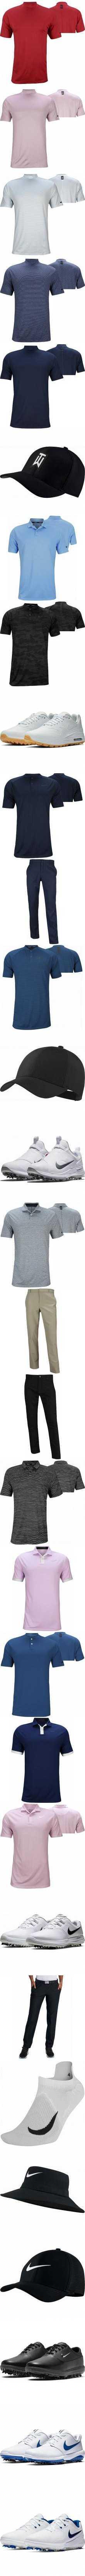 8aff9a27 Nike Dri-FIT Victory Blade Collar Golf Shirts - ON SALE